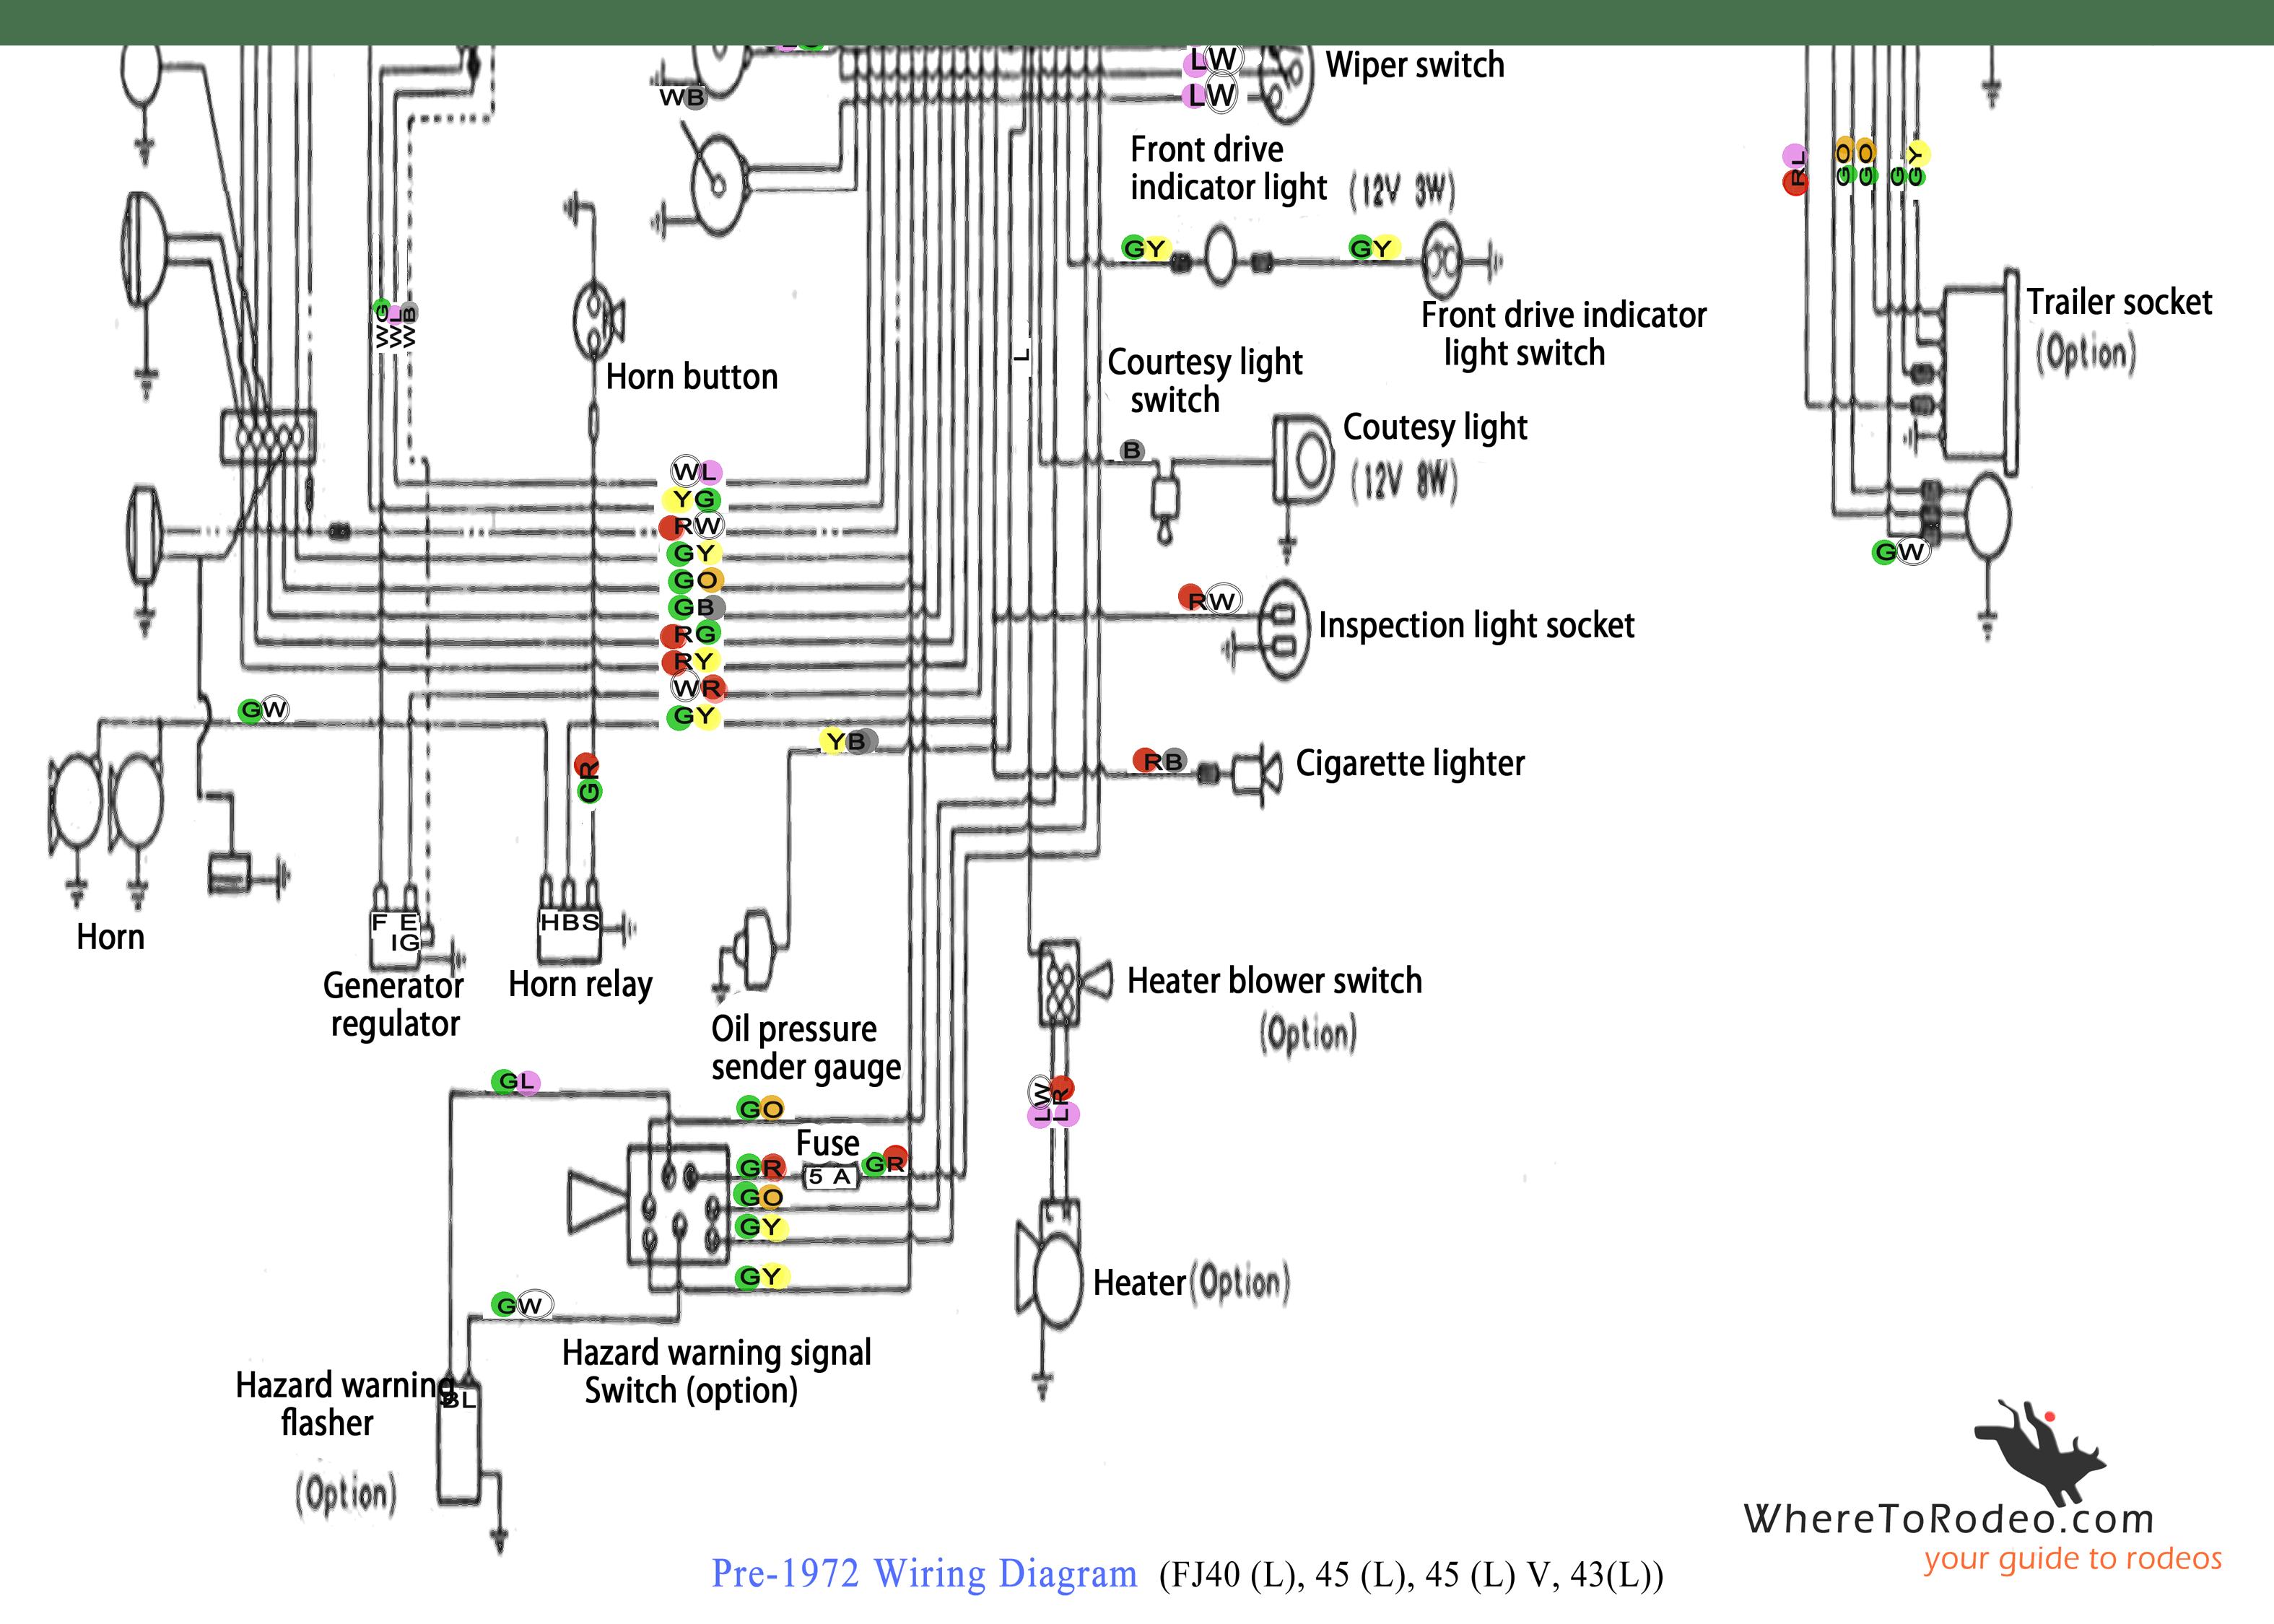 Corvette Windshield Wiper Wiring Diagram